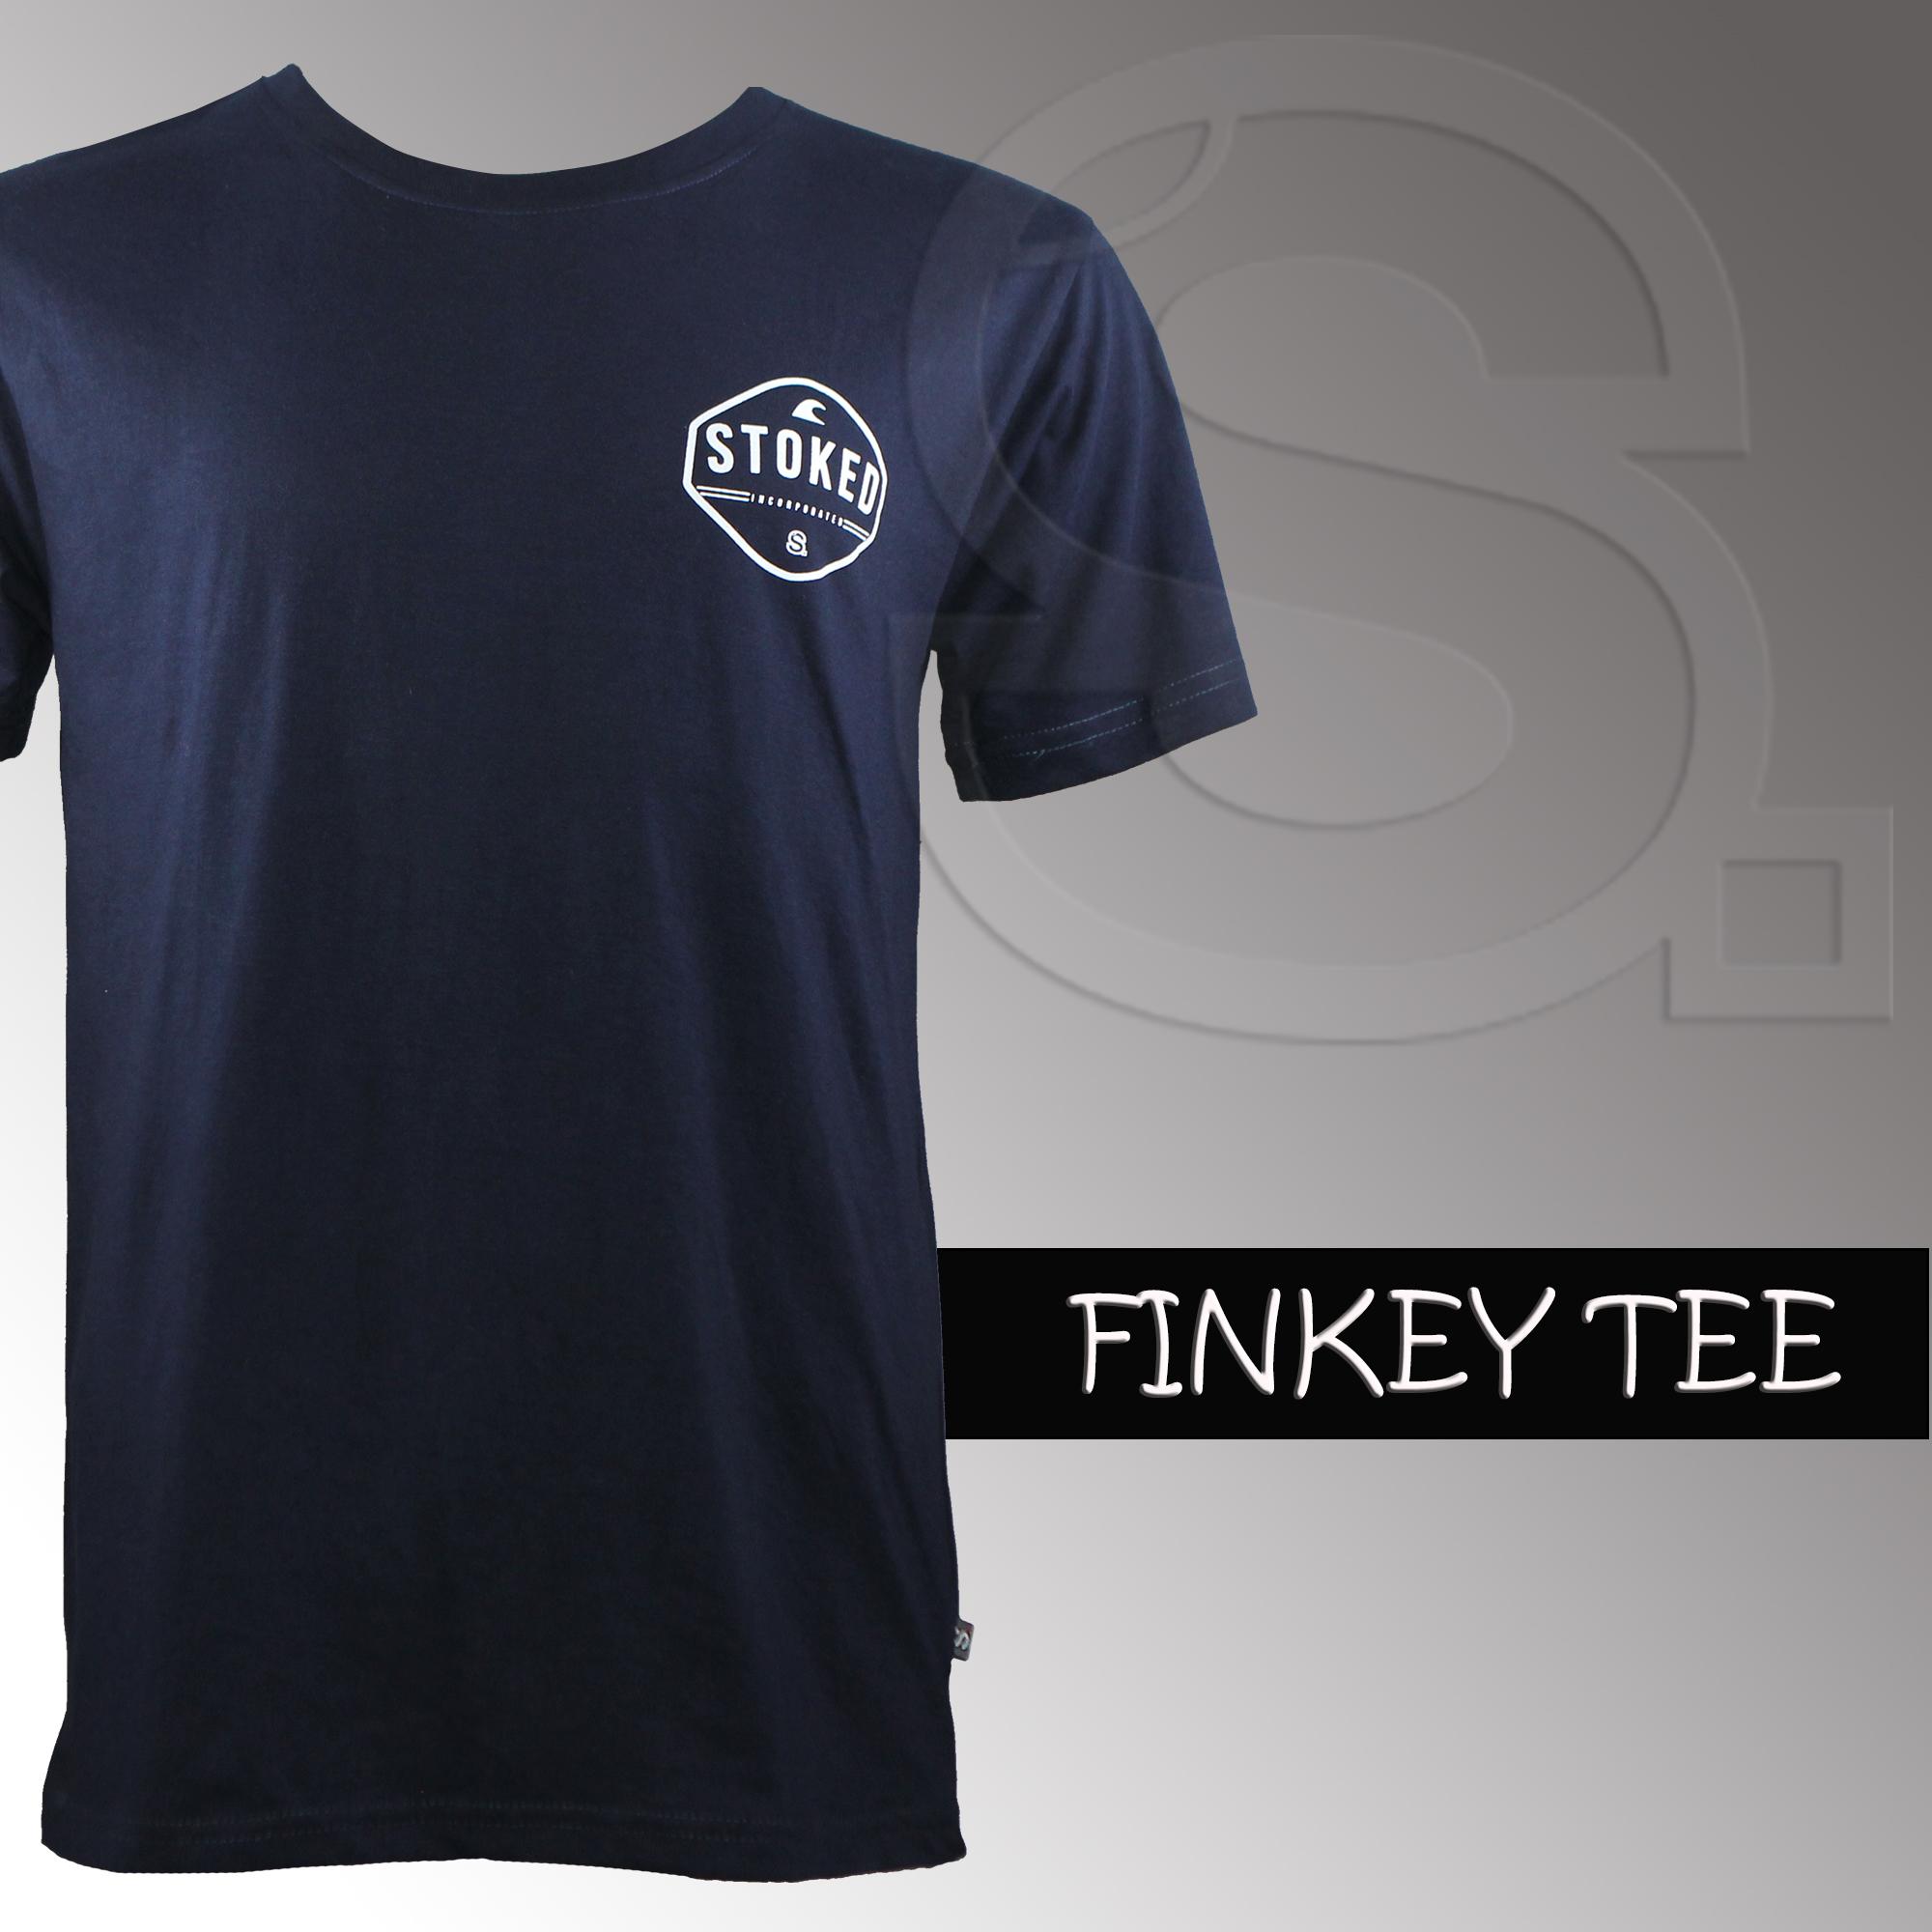 Finkey Tee Php 599.75